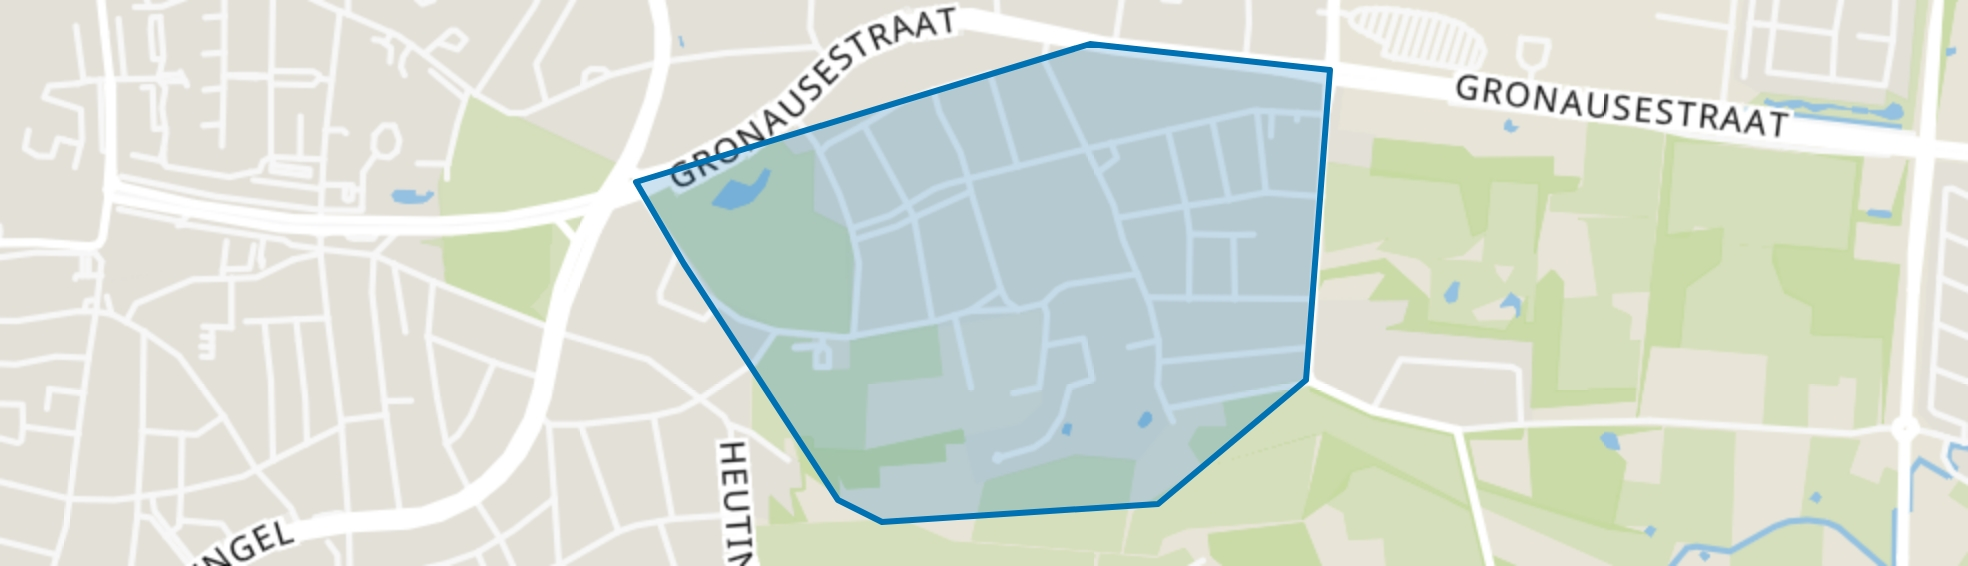 Wooldrik, Enschede map